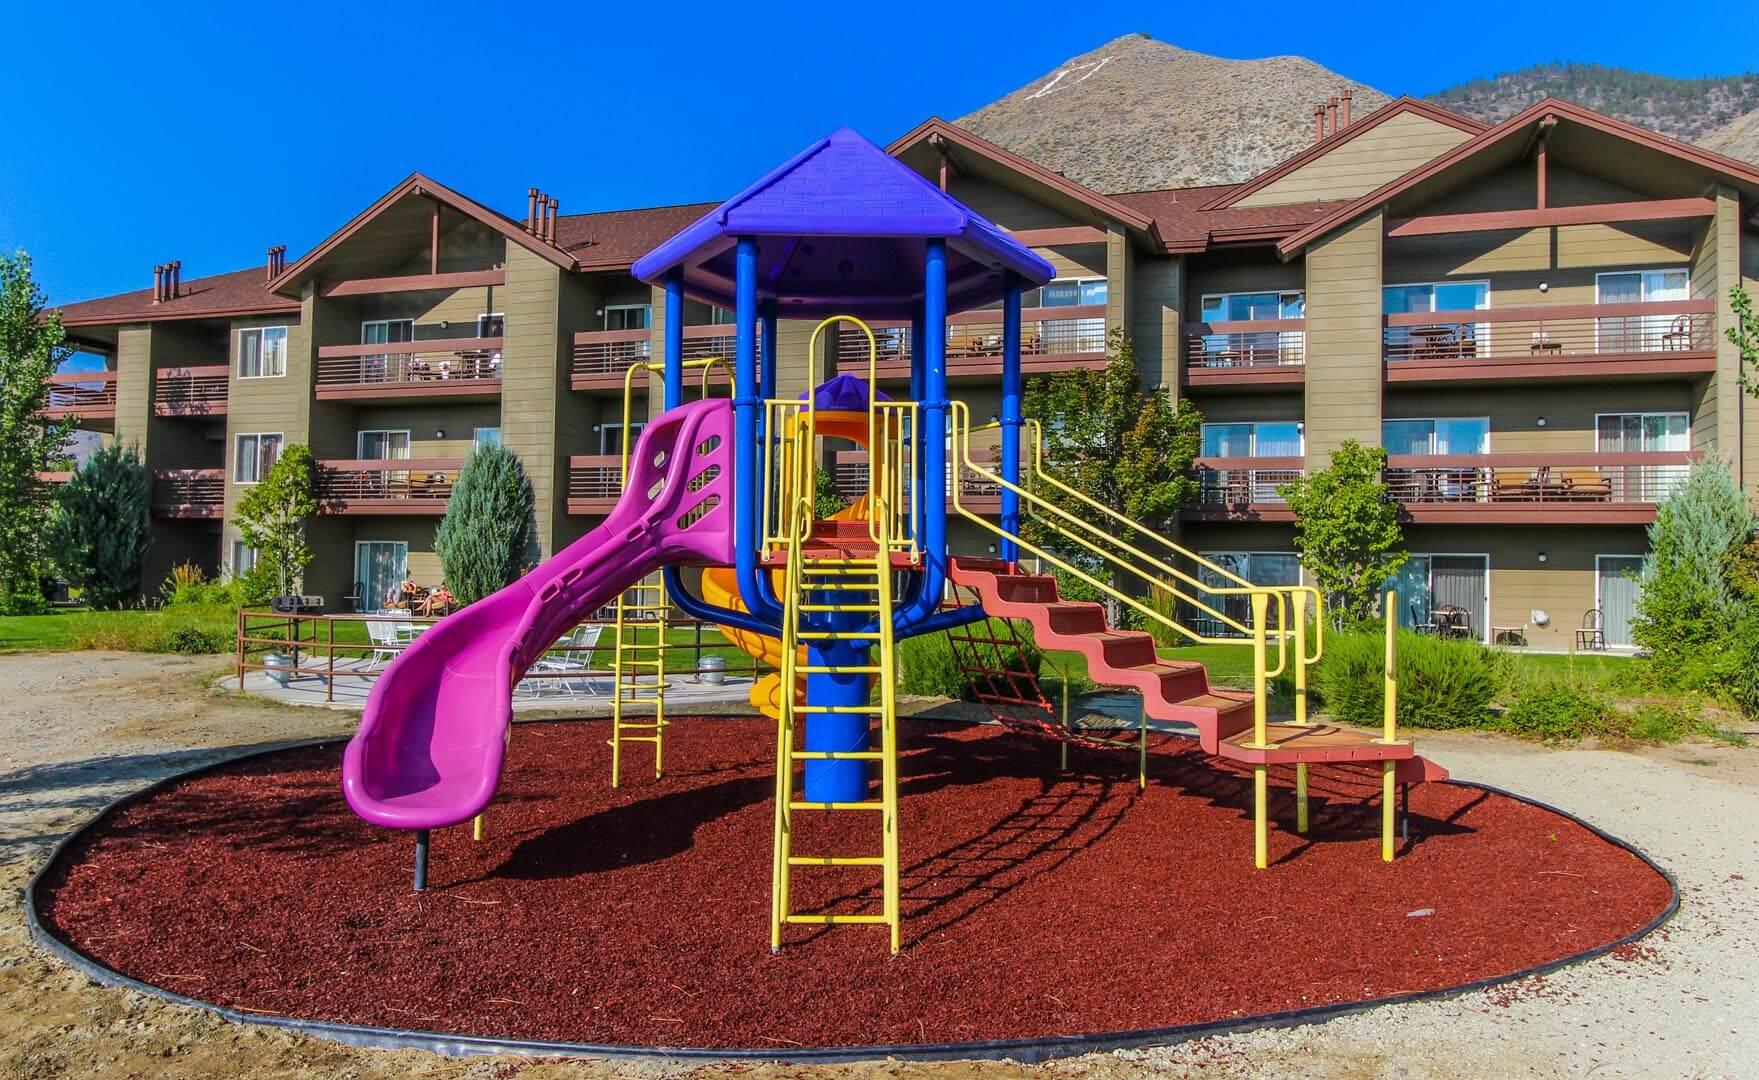 David Walleys Playground